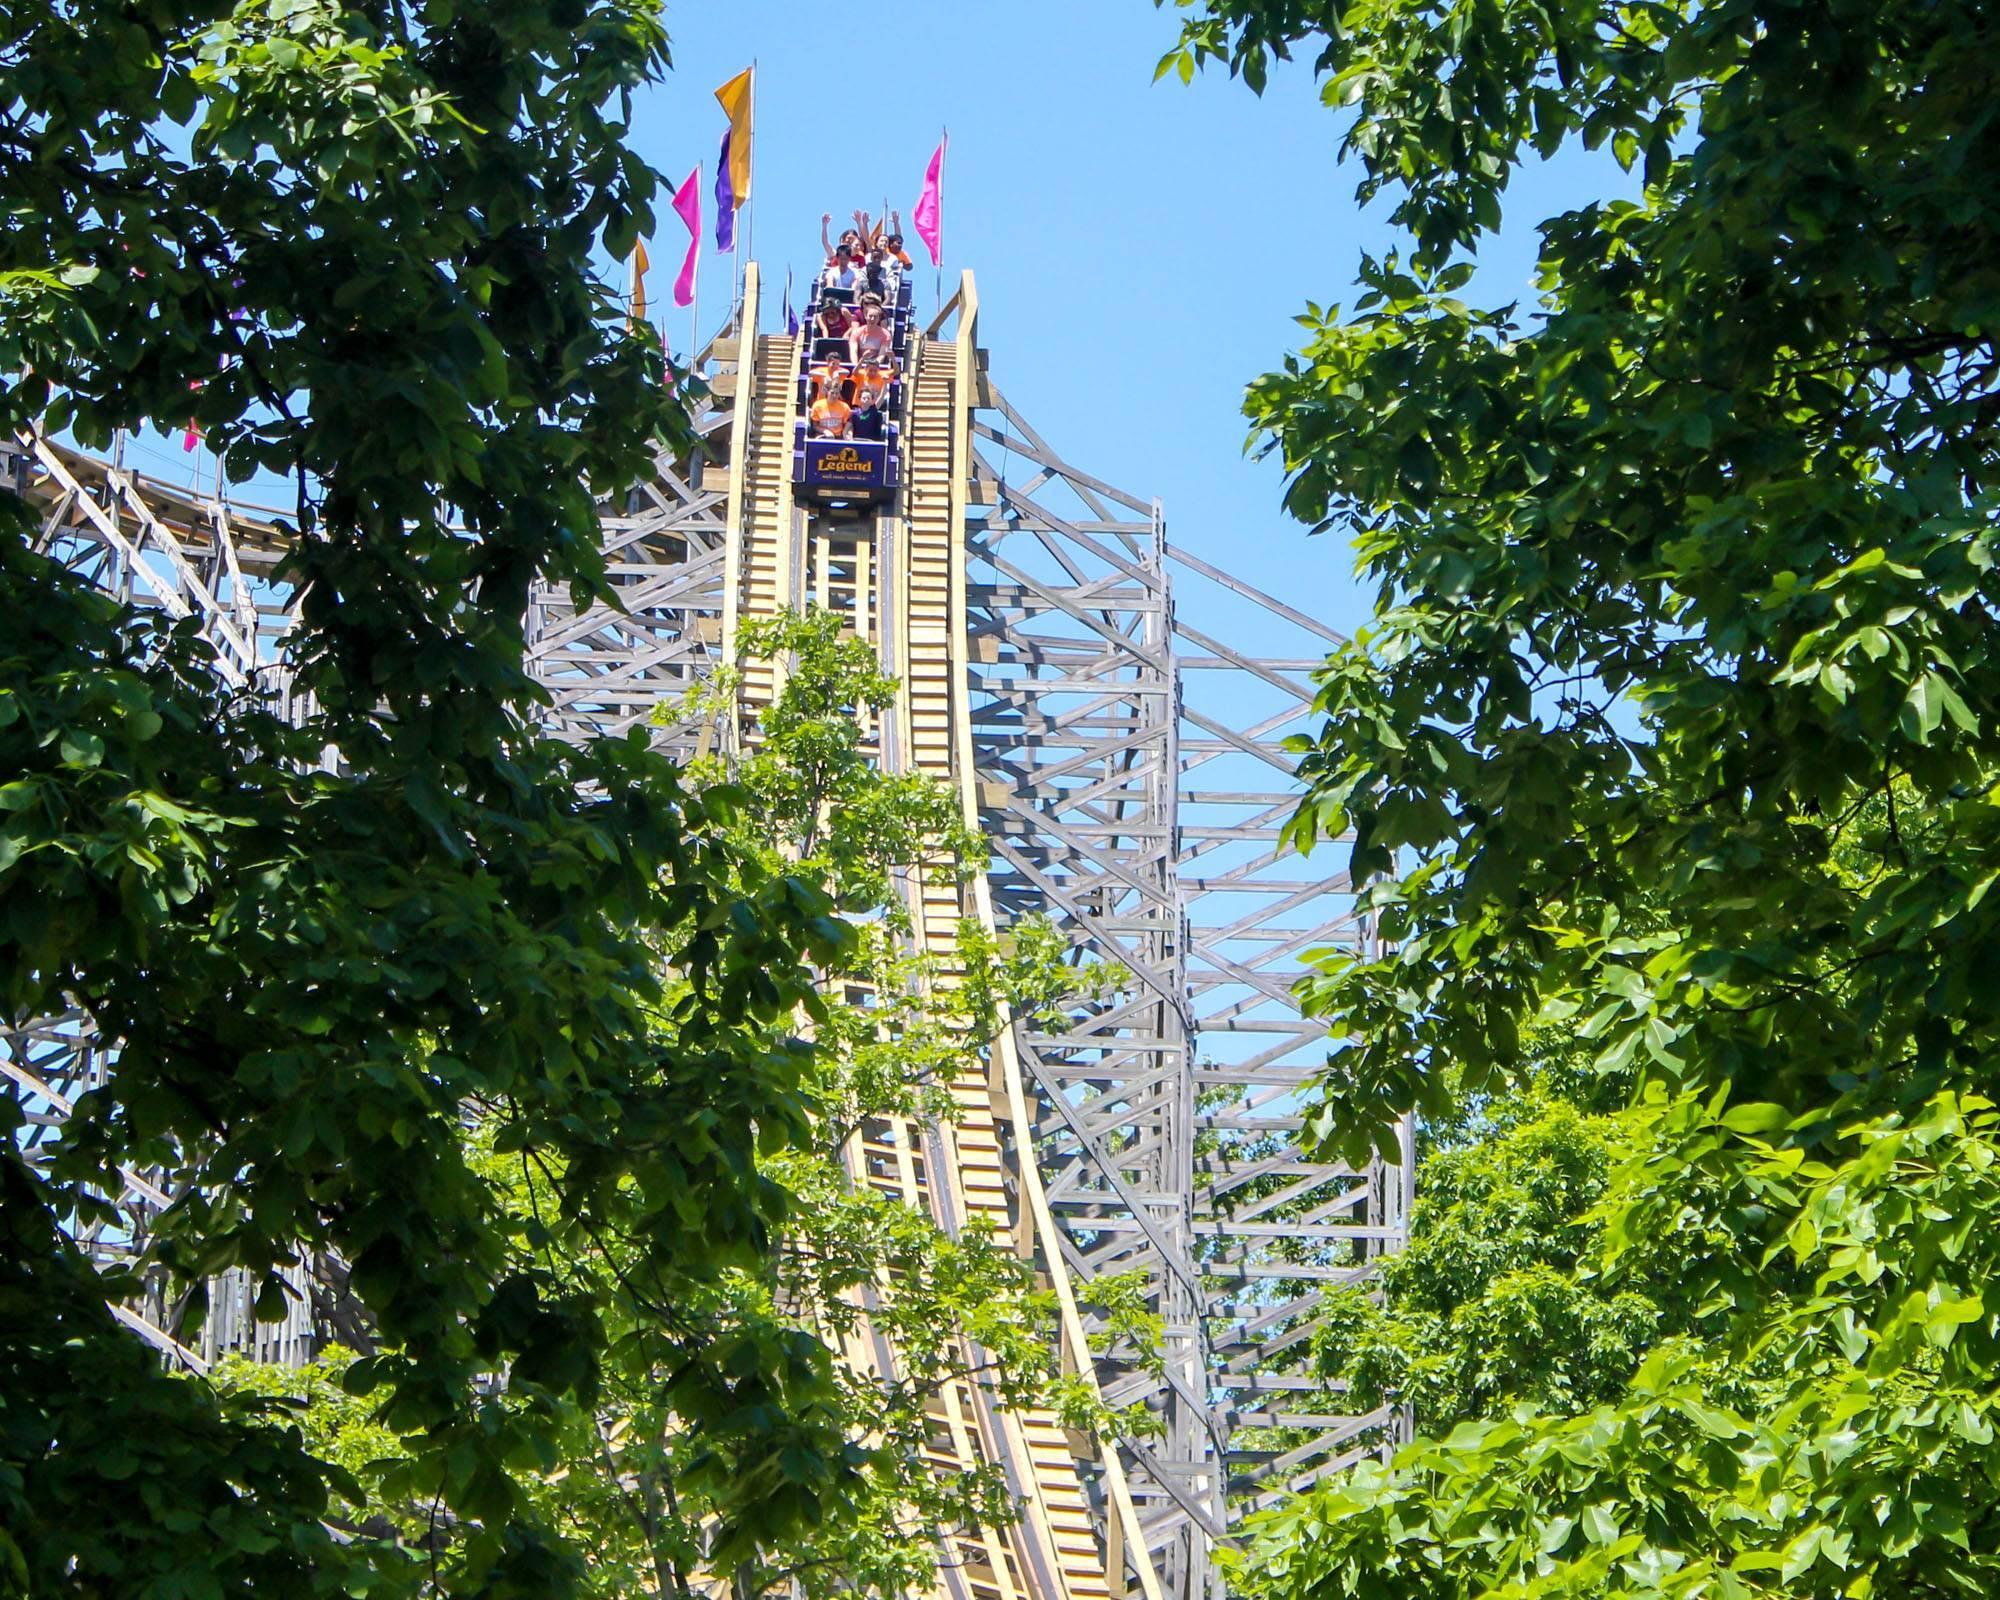 The Legend Wooden Roller Coaster   Holiday World & Splashin' Safari